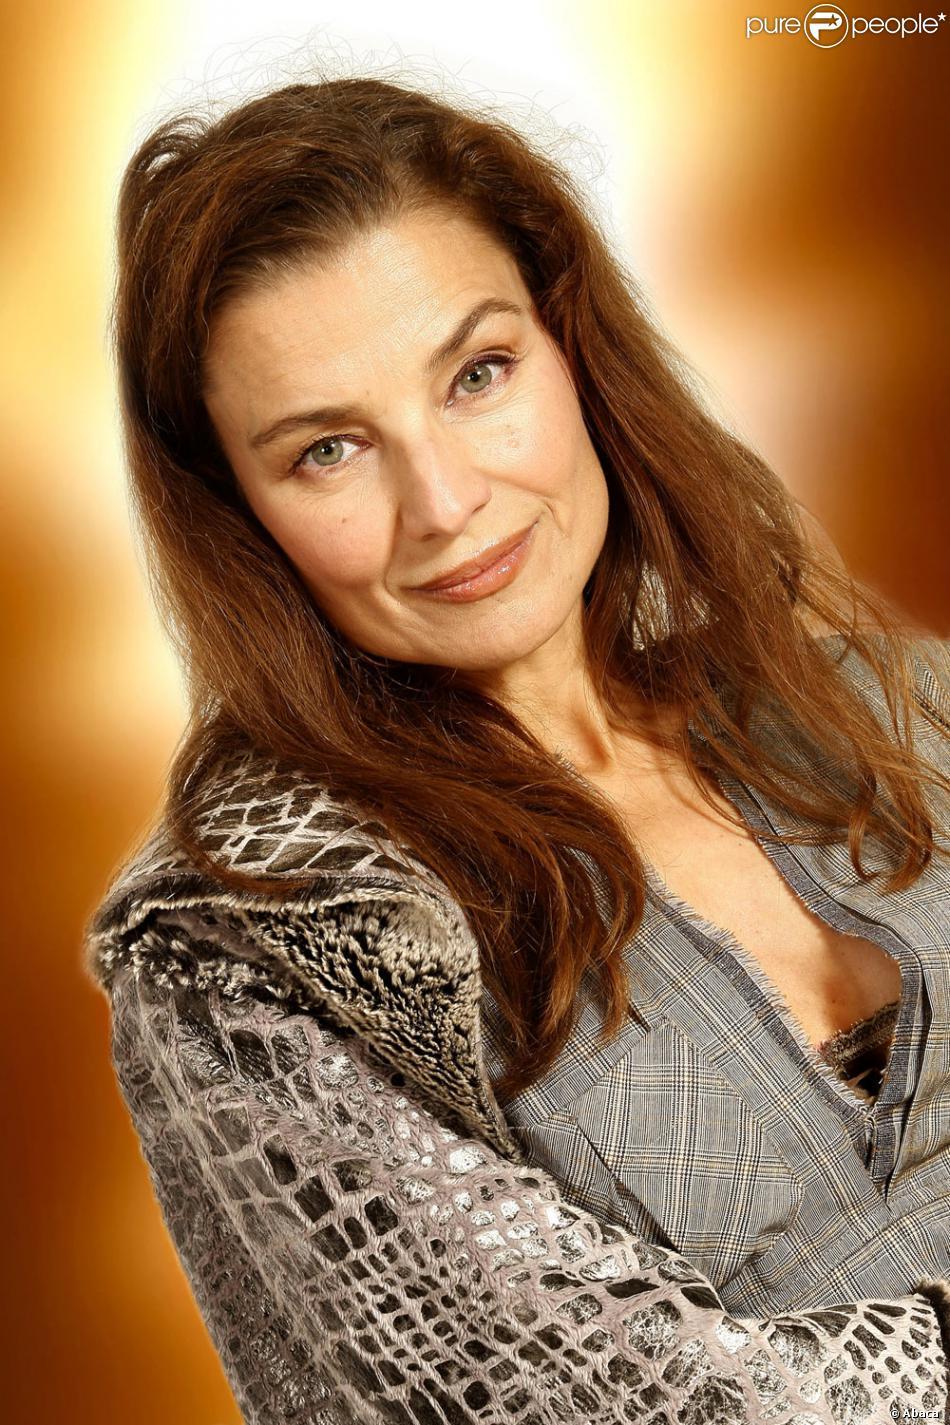 Cheryl Lyone